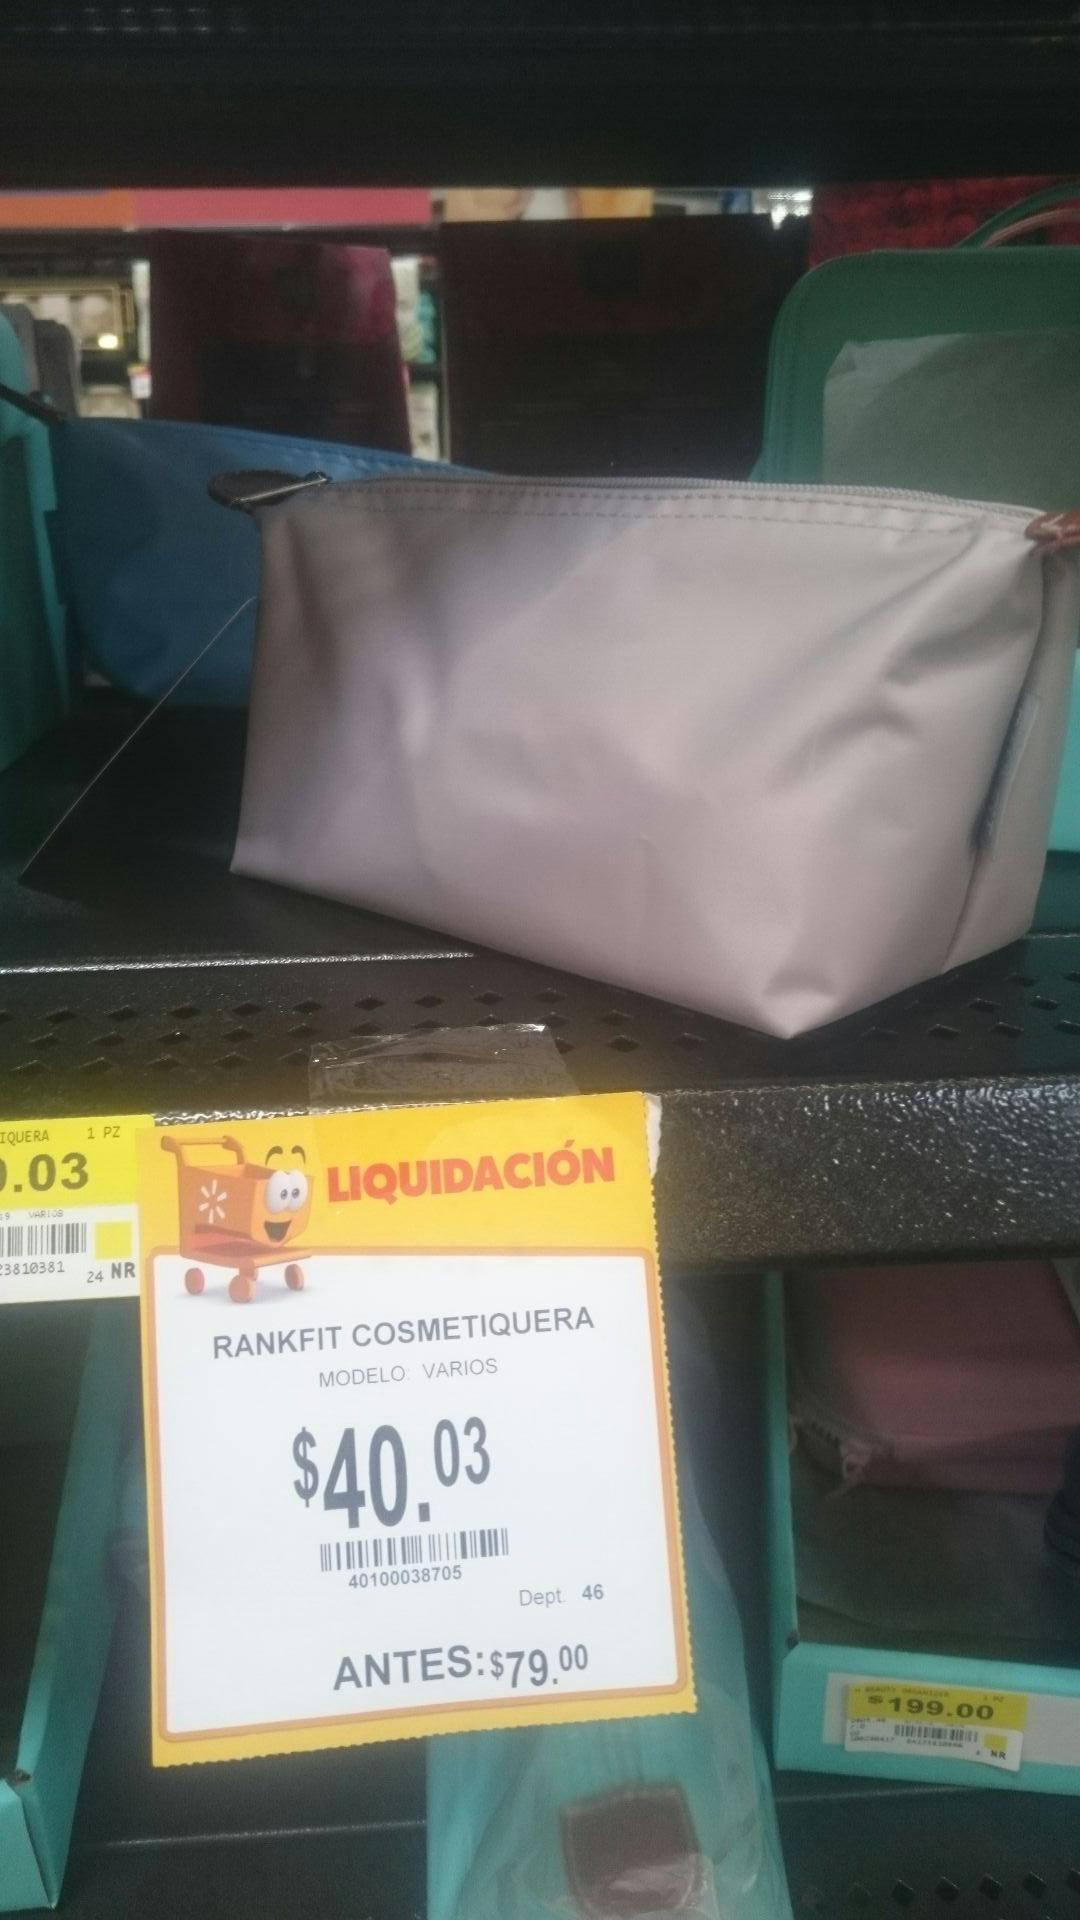 Walmart: Cosmetiquera Rankfit